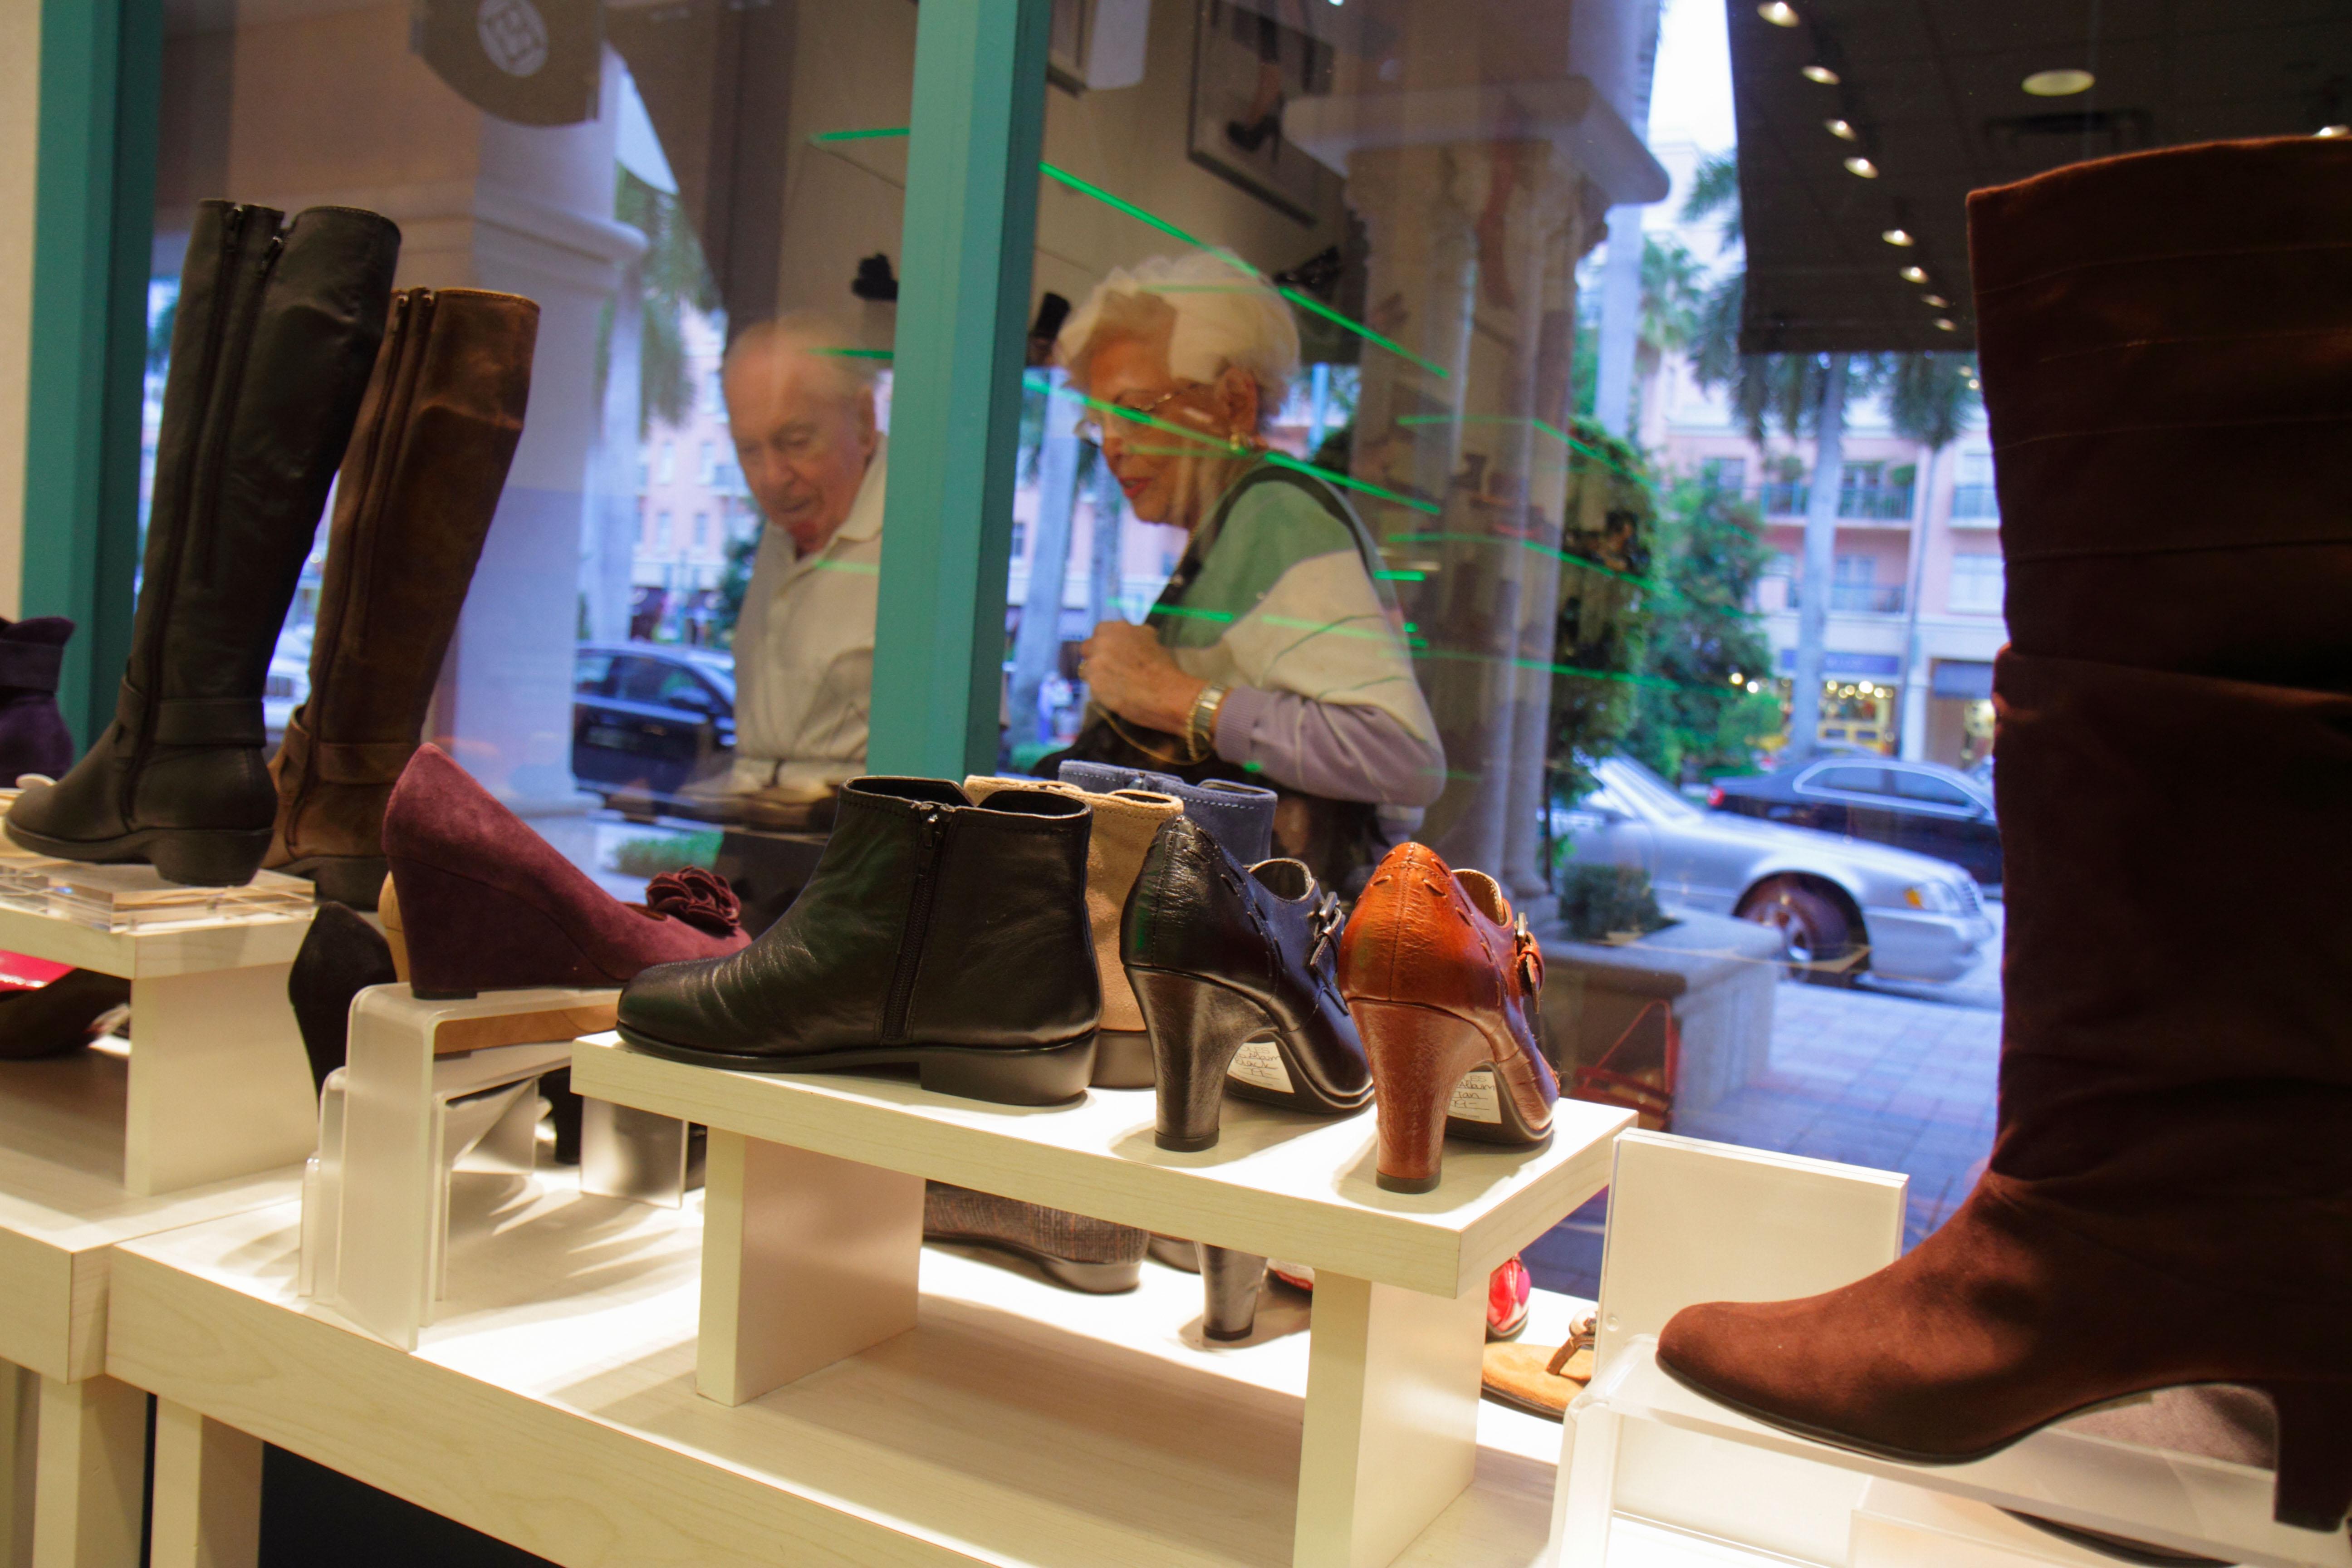 Boca Raton Florida Mizner Park Plaza Real shopping retail display for sale Aerosoles shoes women's comfort suede boots senior ma